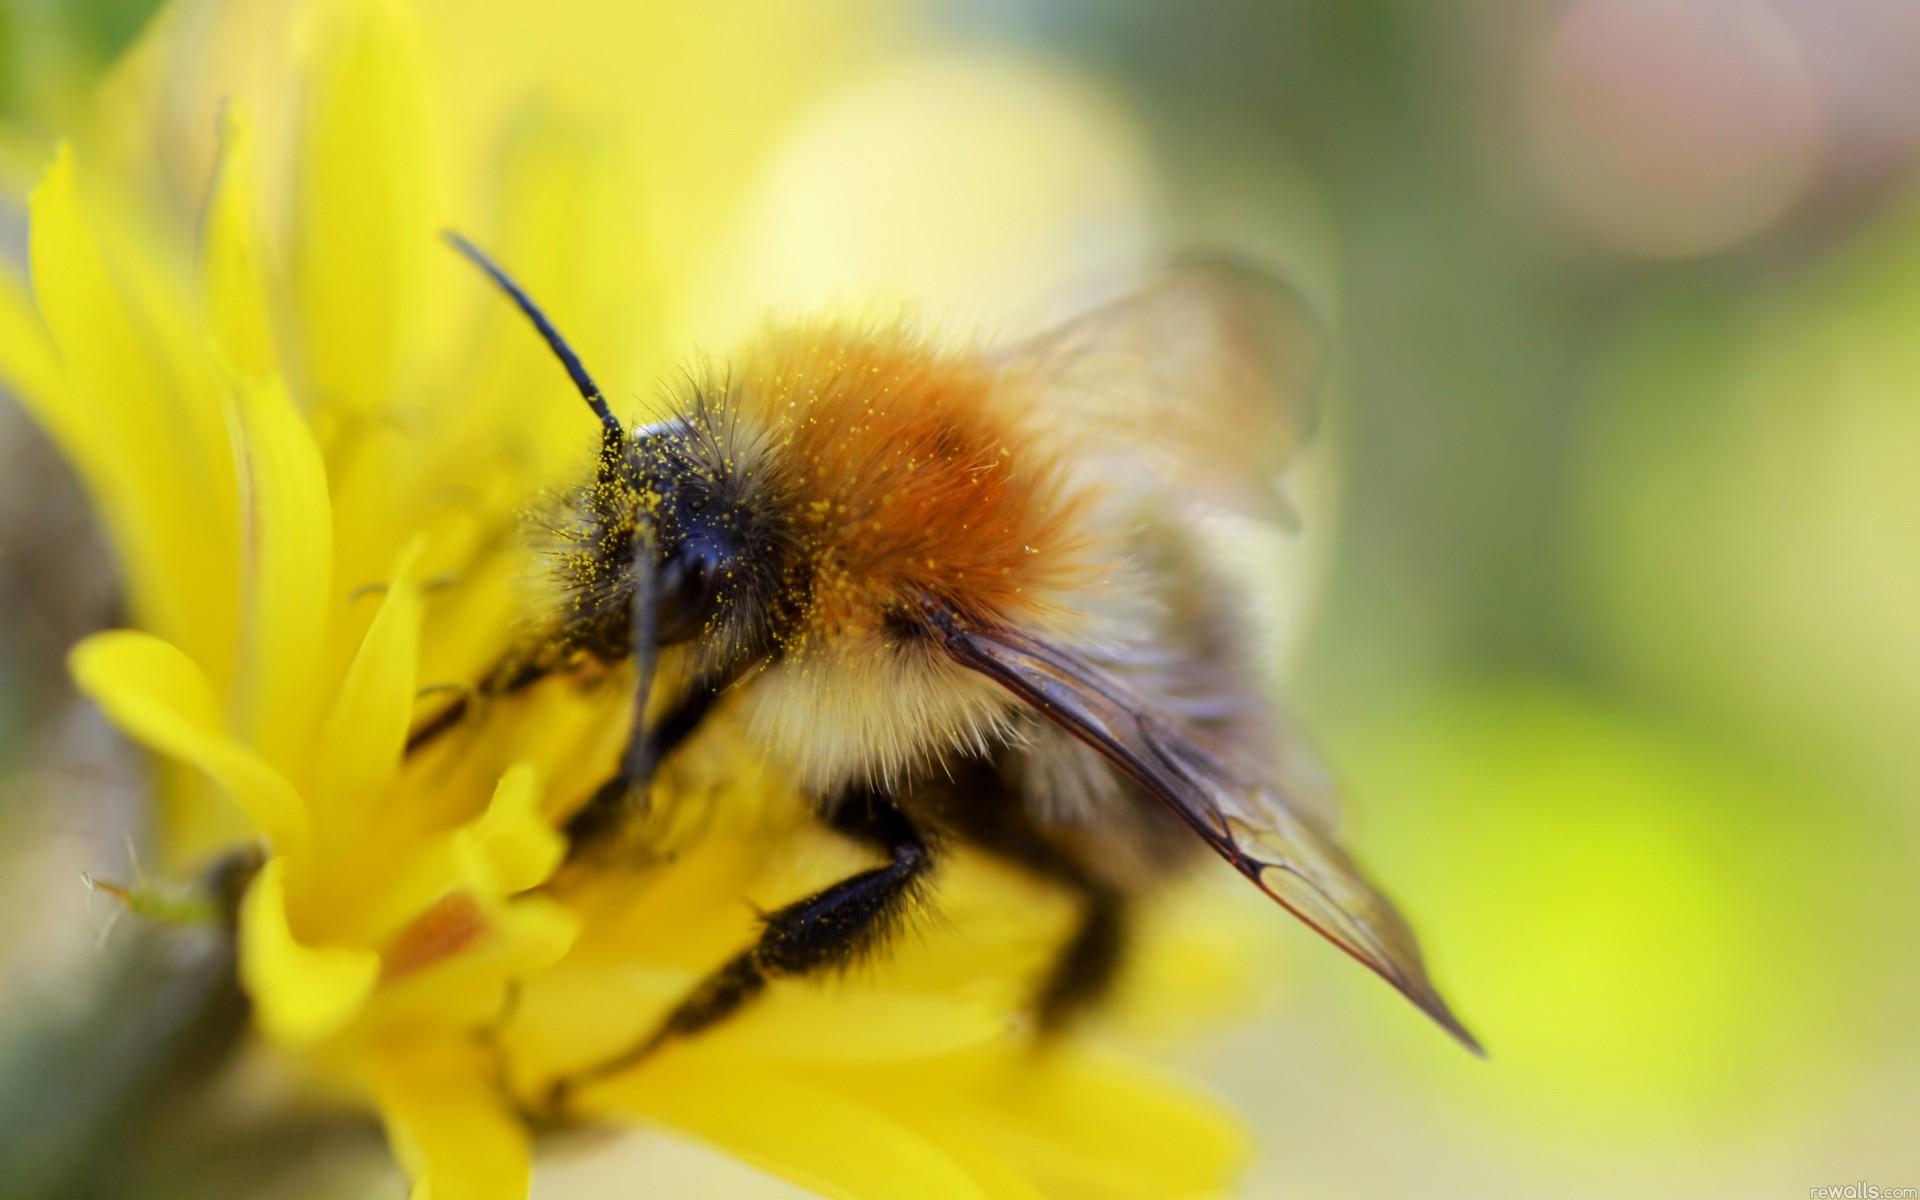 Abeja recolectando polen - 1920x1200